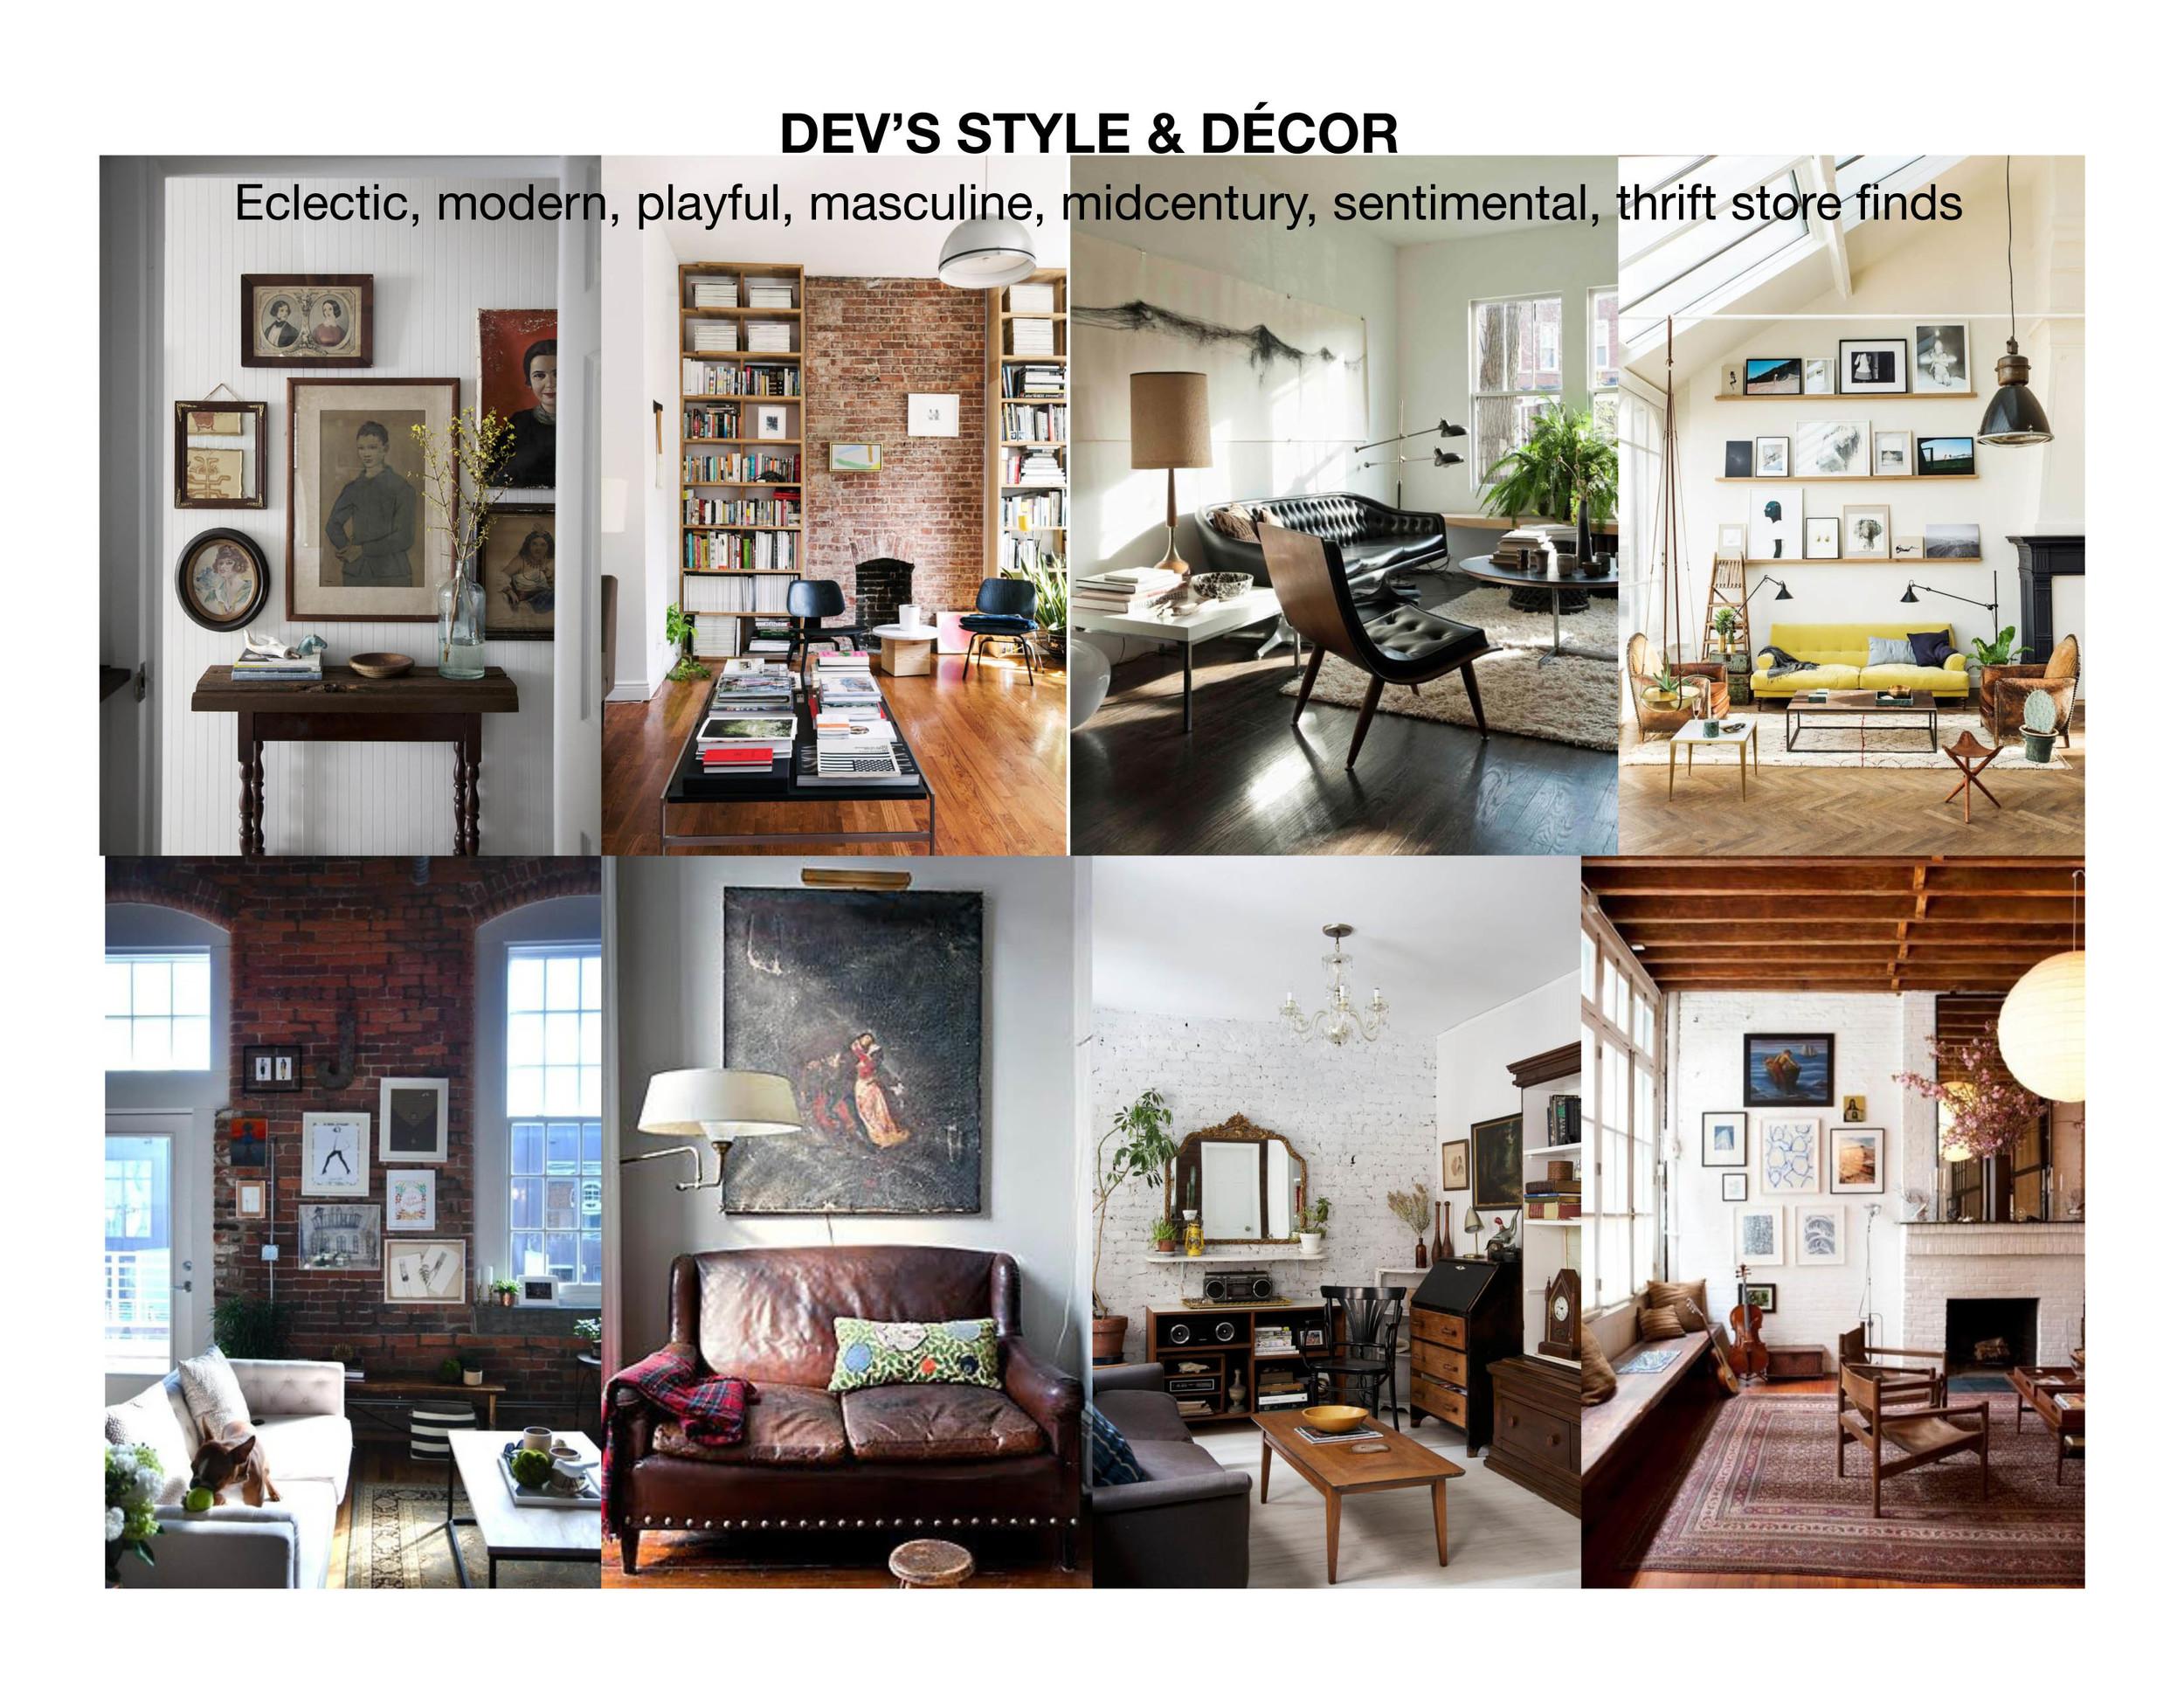 Dev's Apartment Inspiration